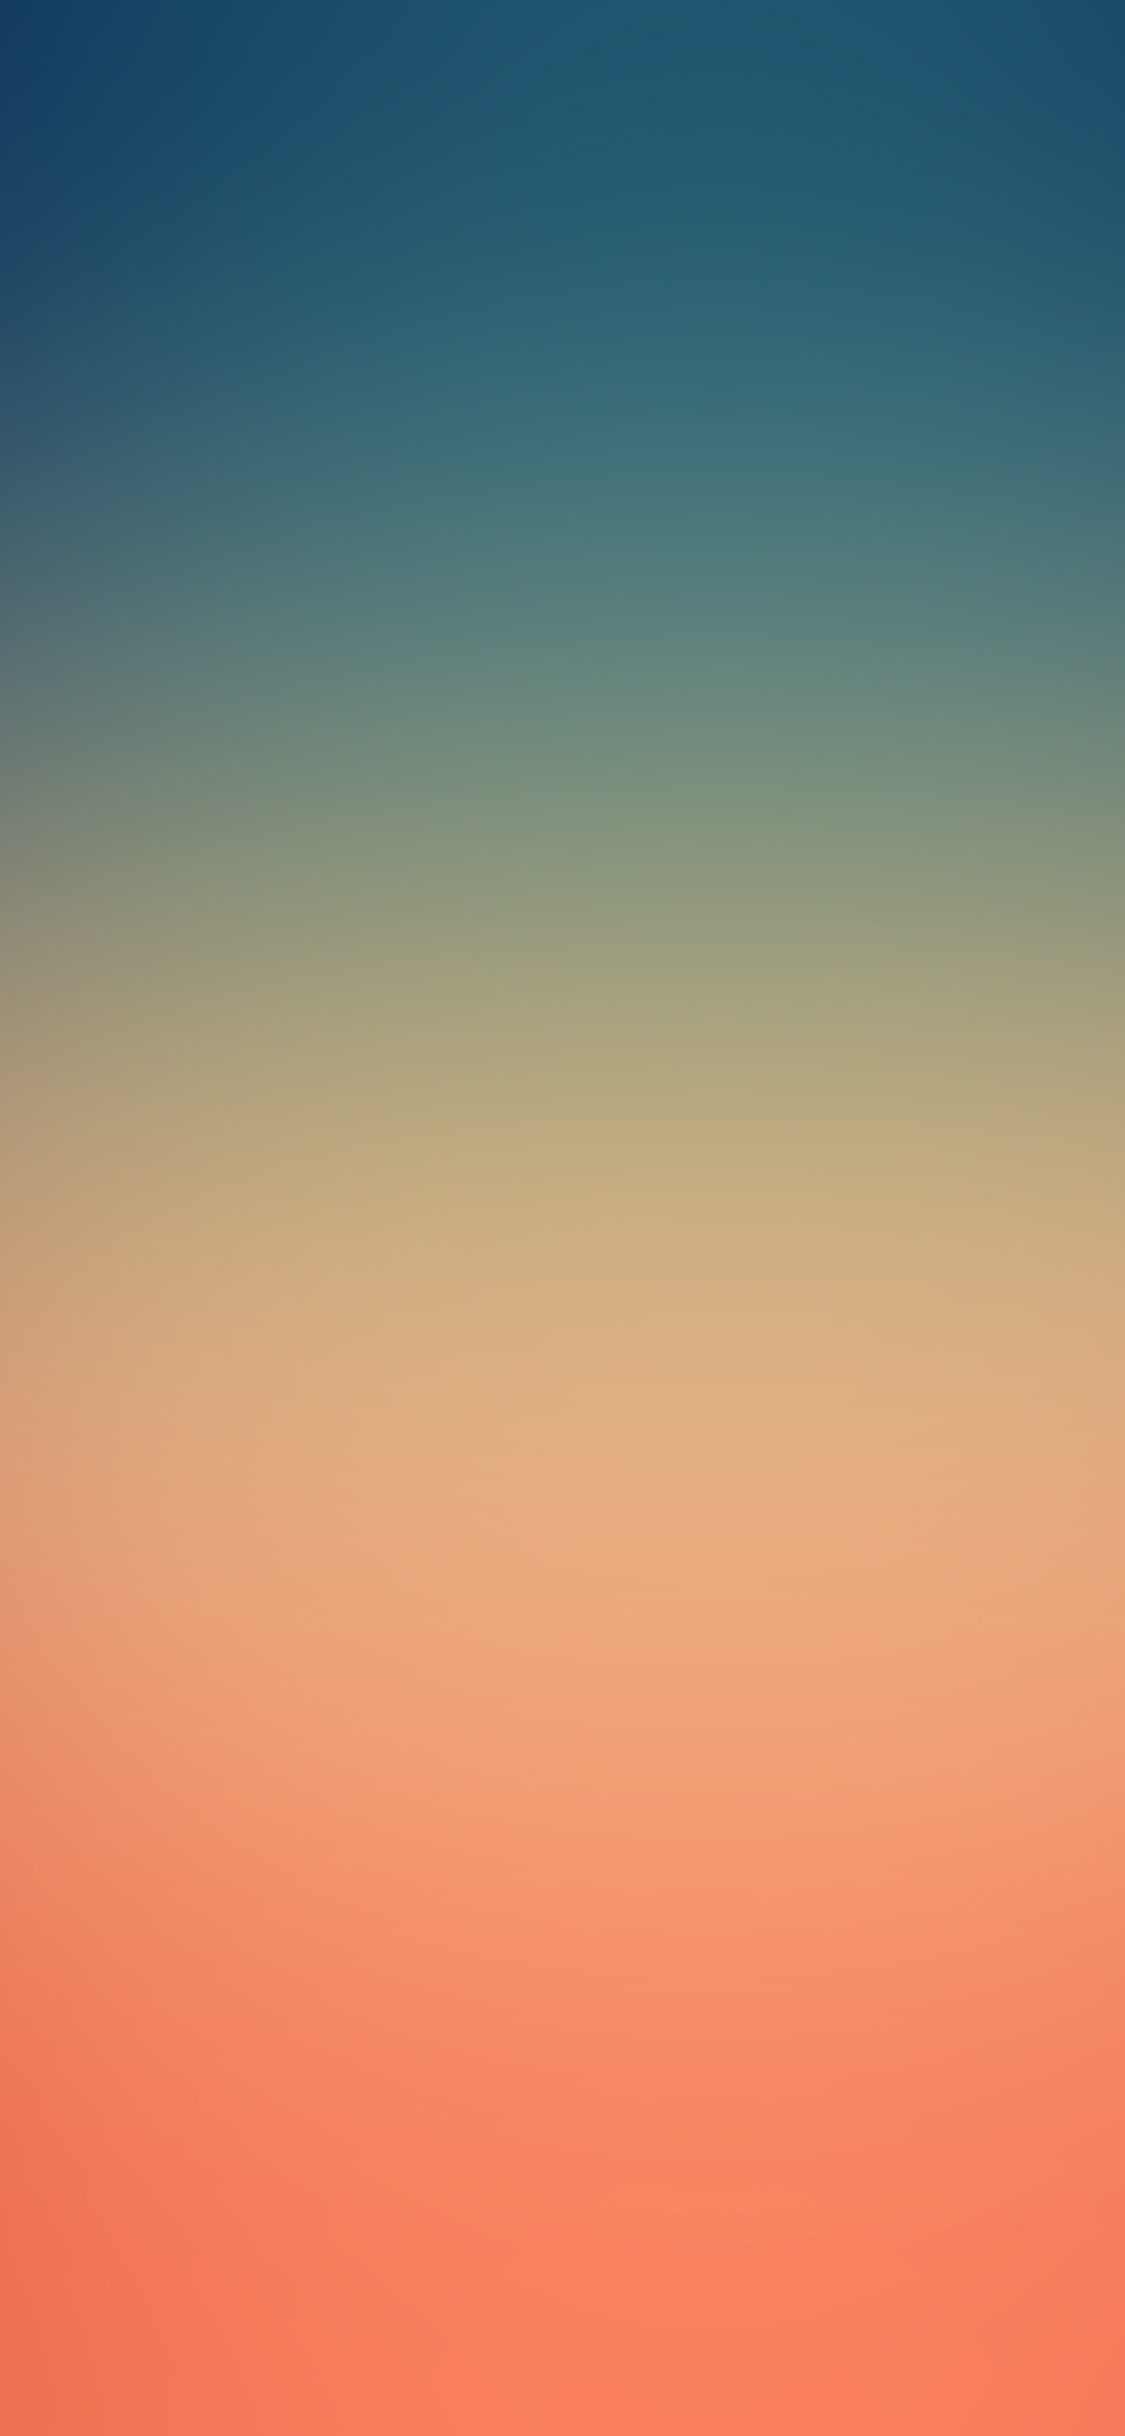 papers.co sk83 blue orange night blur gradation 41 iphone wallpaper